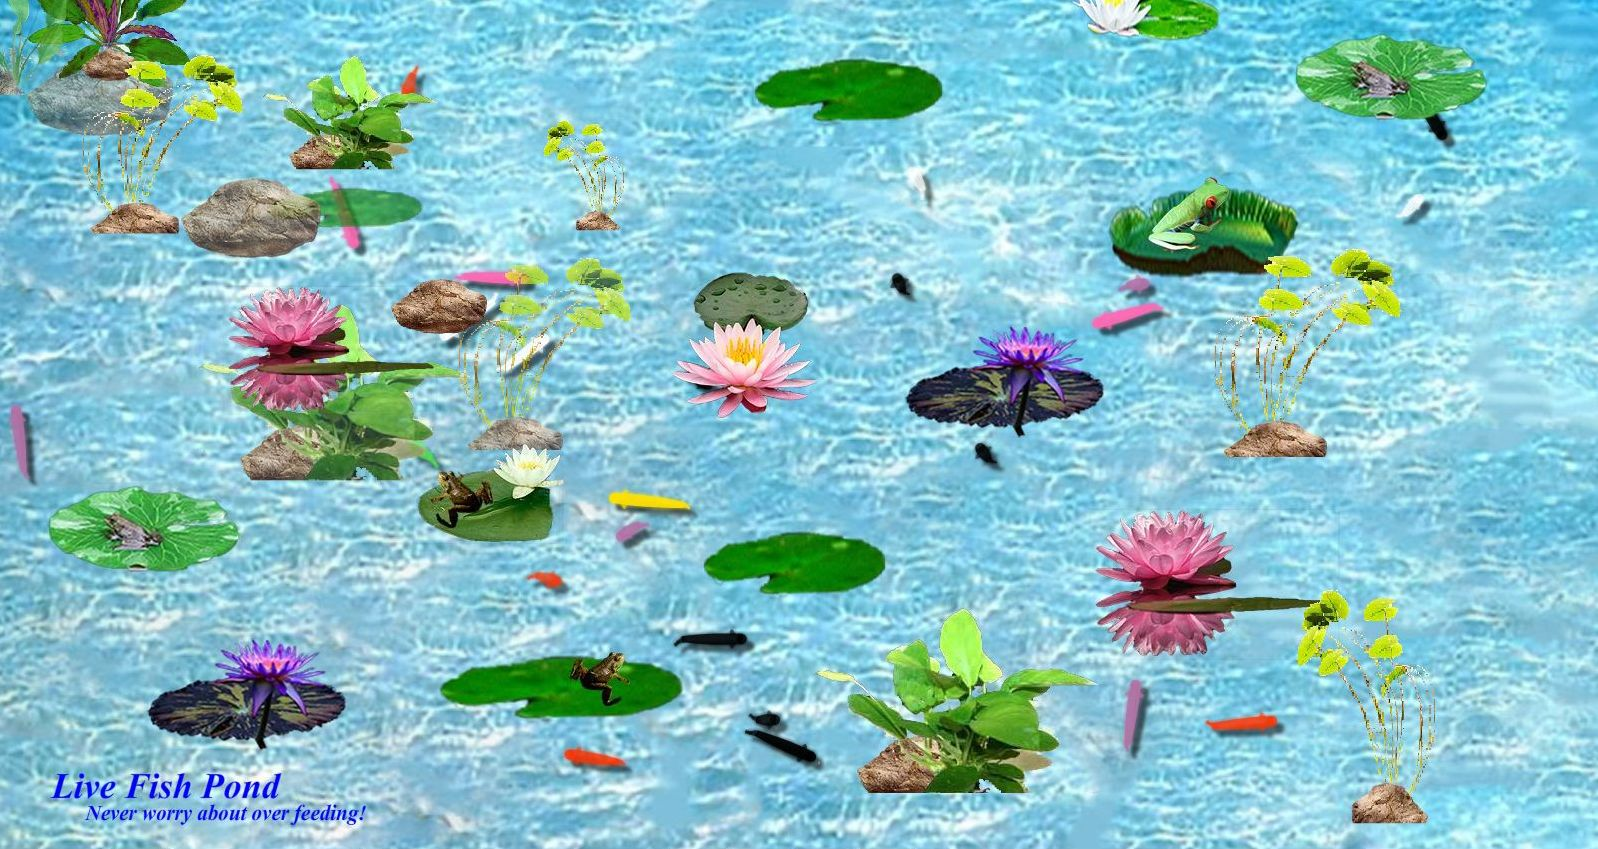 jeu-de-bassin-poissons-interactifs-telechargement